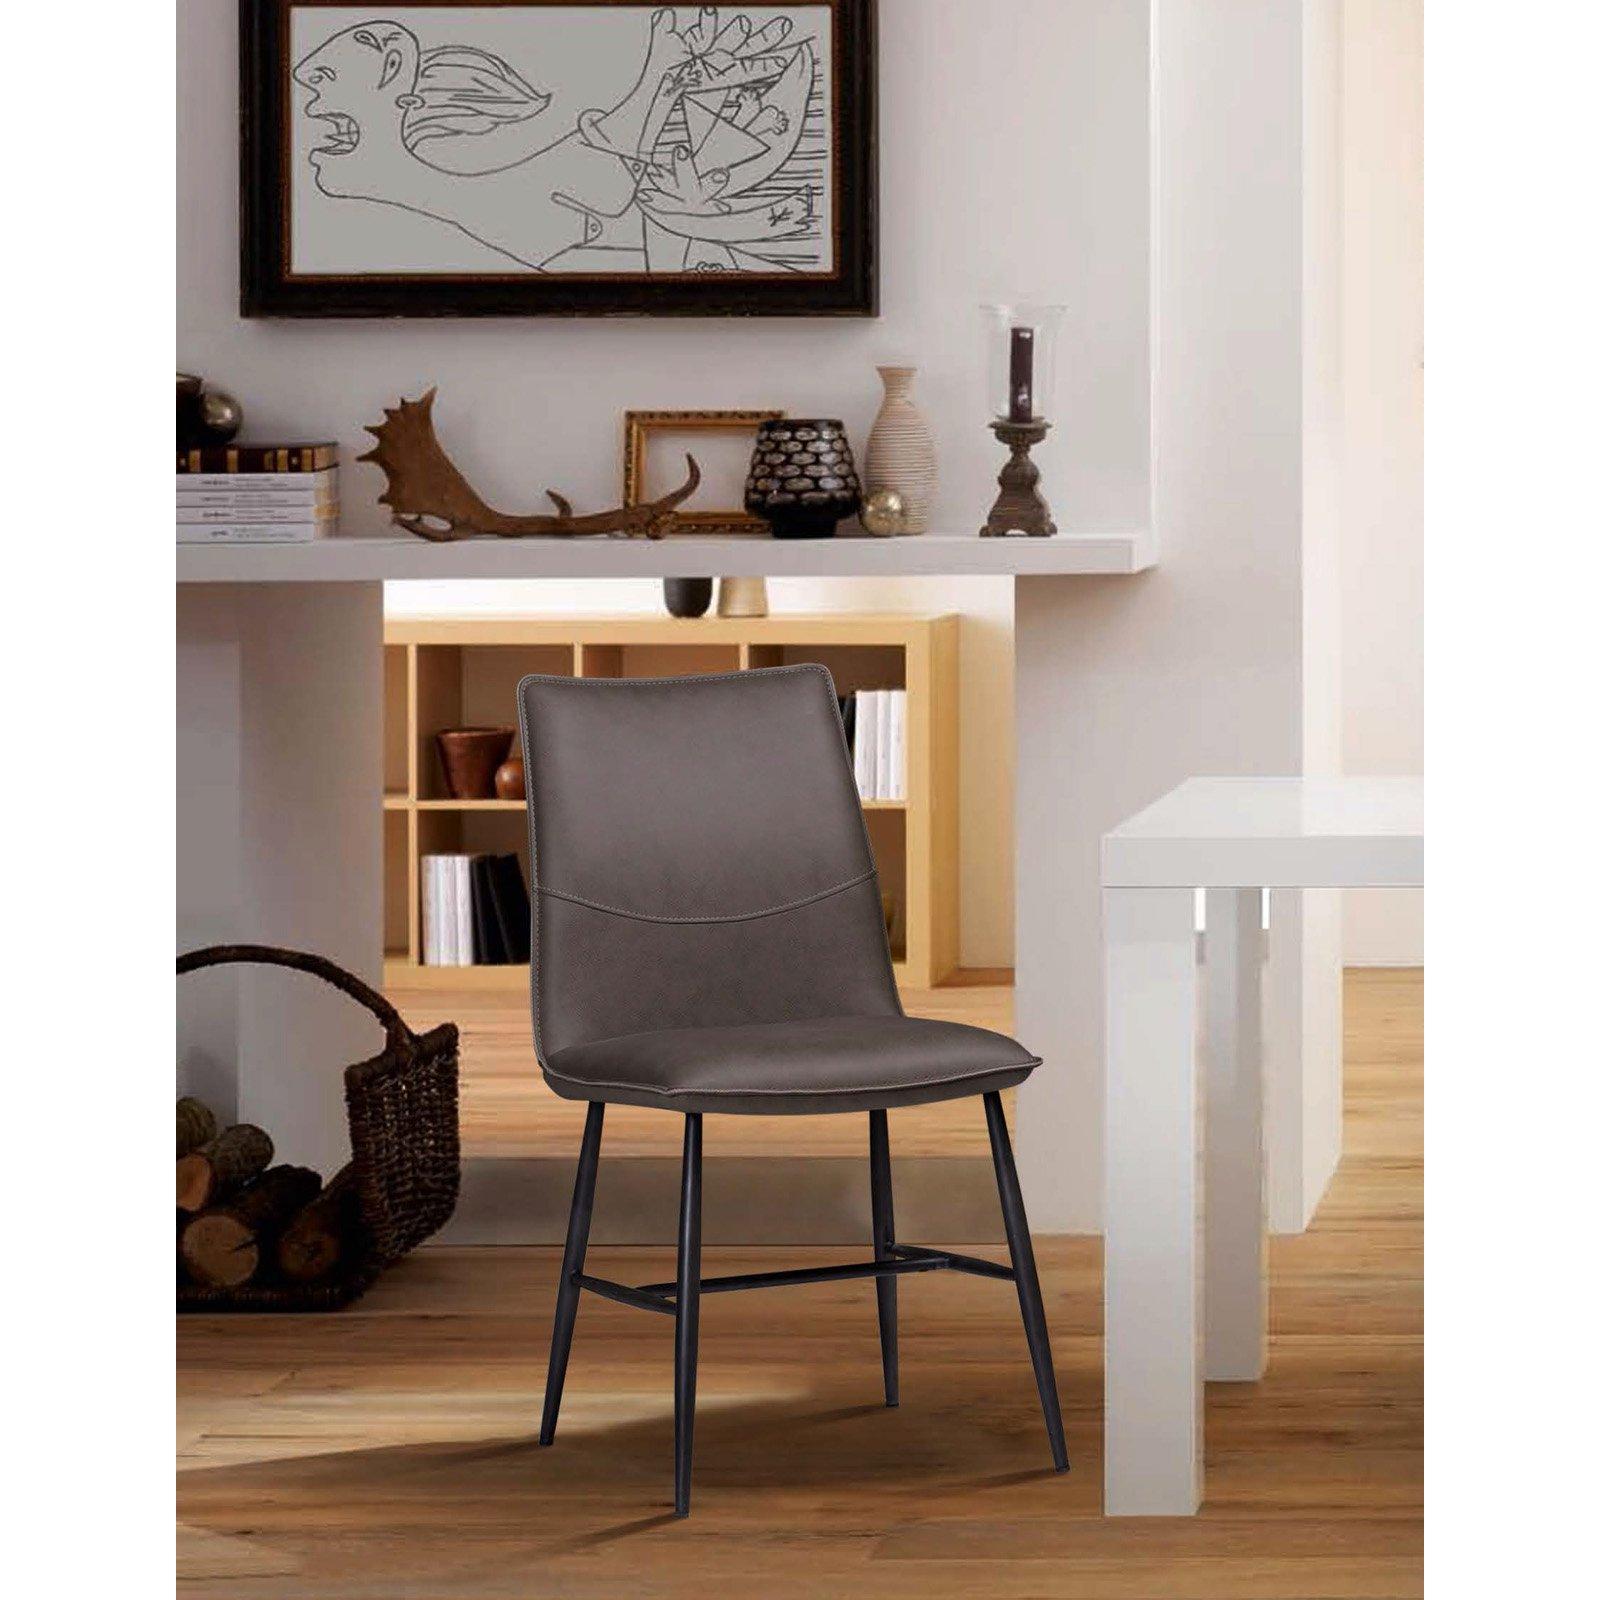 Modus Kara Scoop Modern Dining Chair Set of 2 by Modus Furniture International